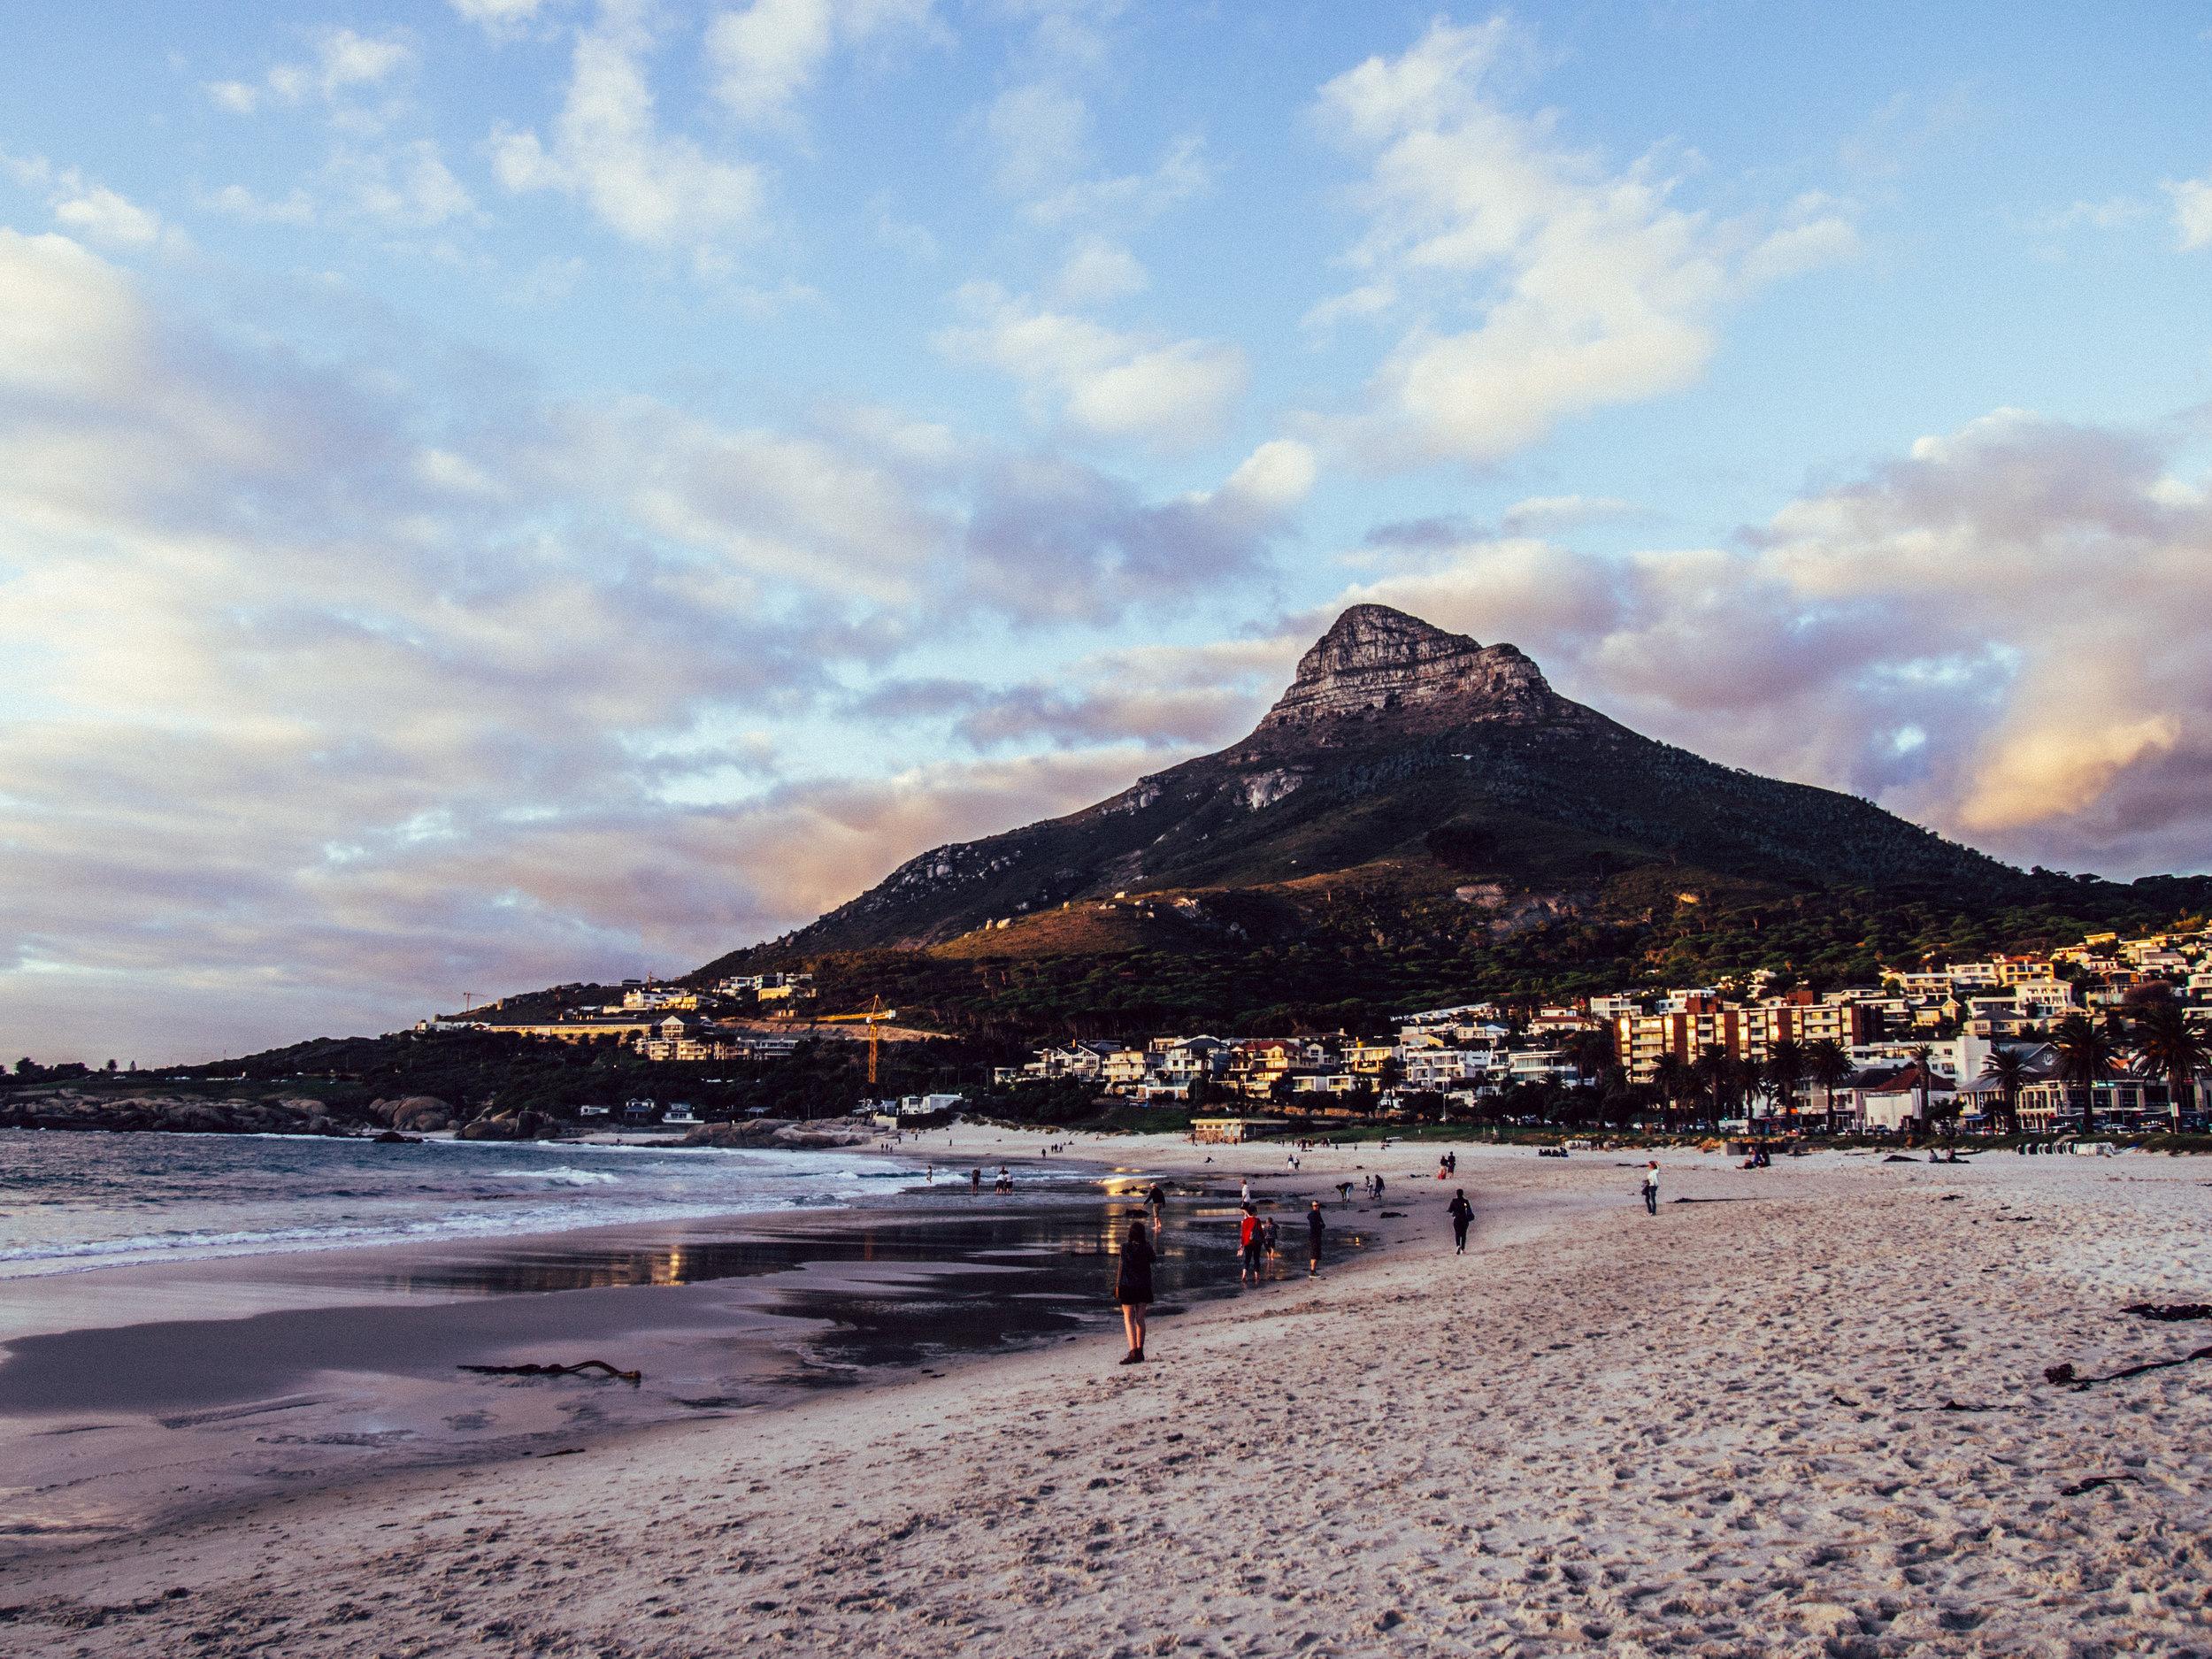 Camps Bay Beach, Cape Town 2015